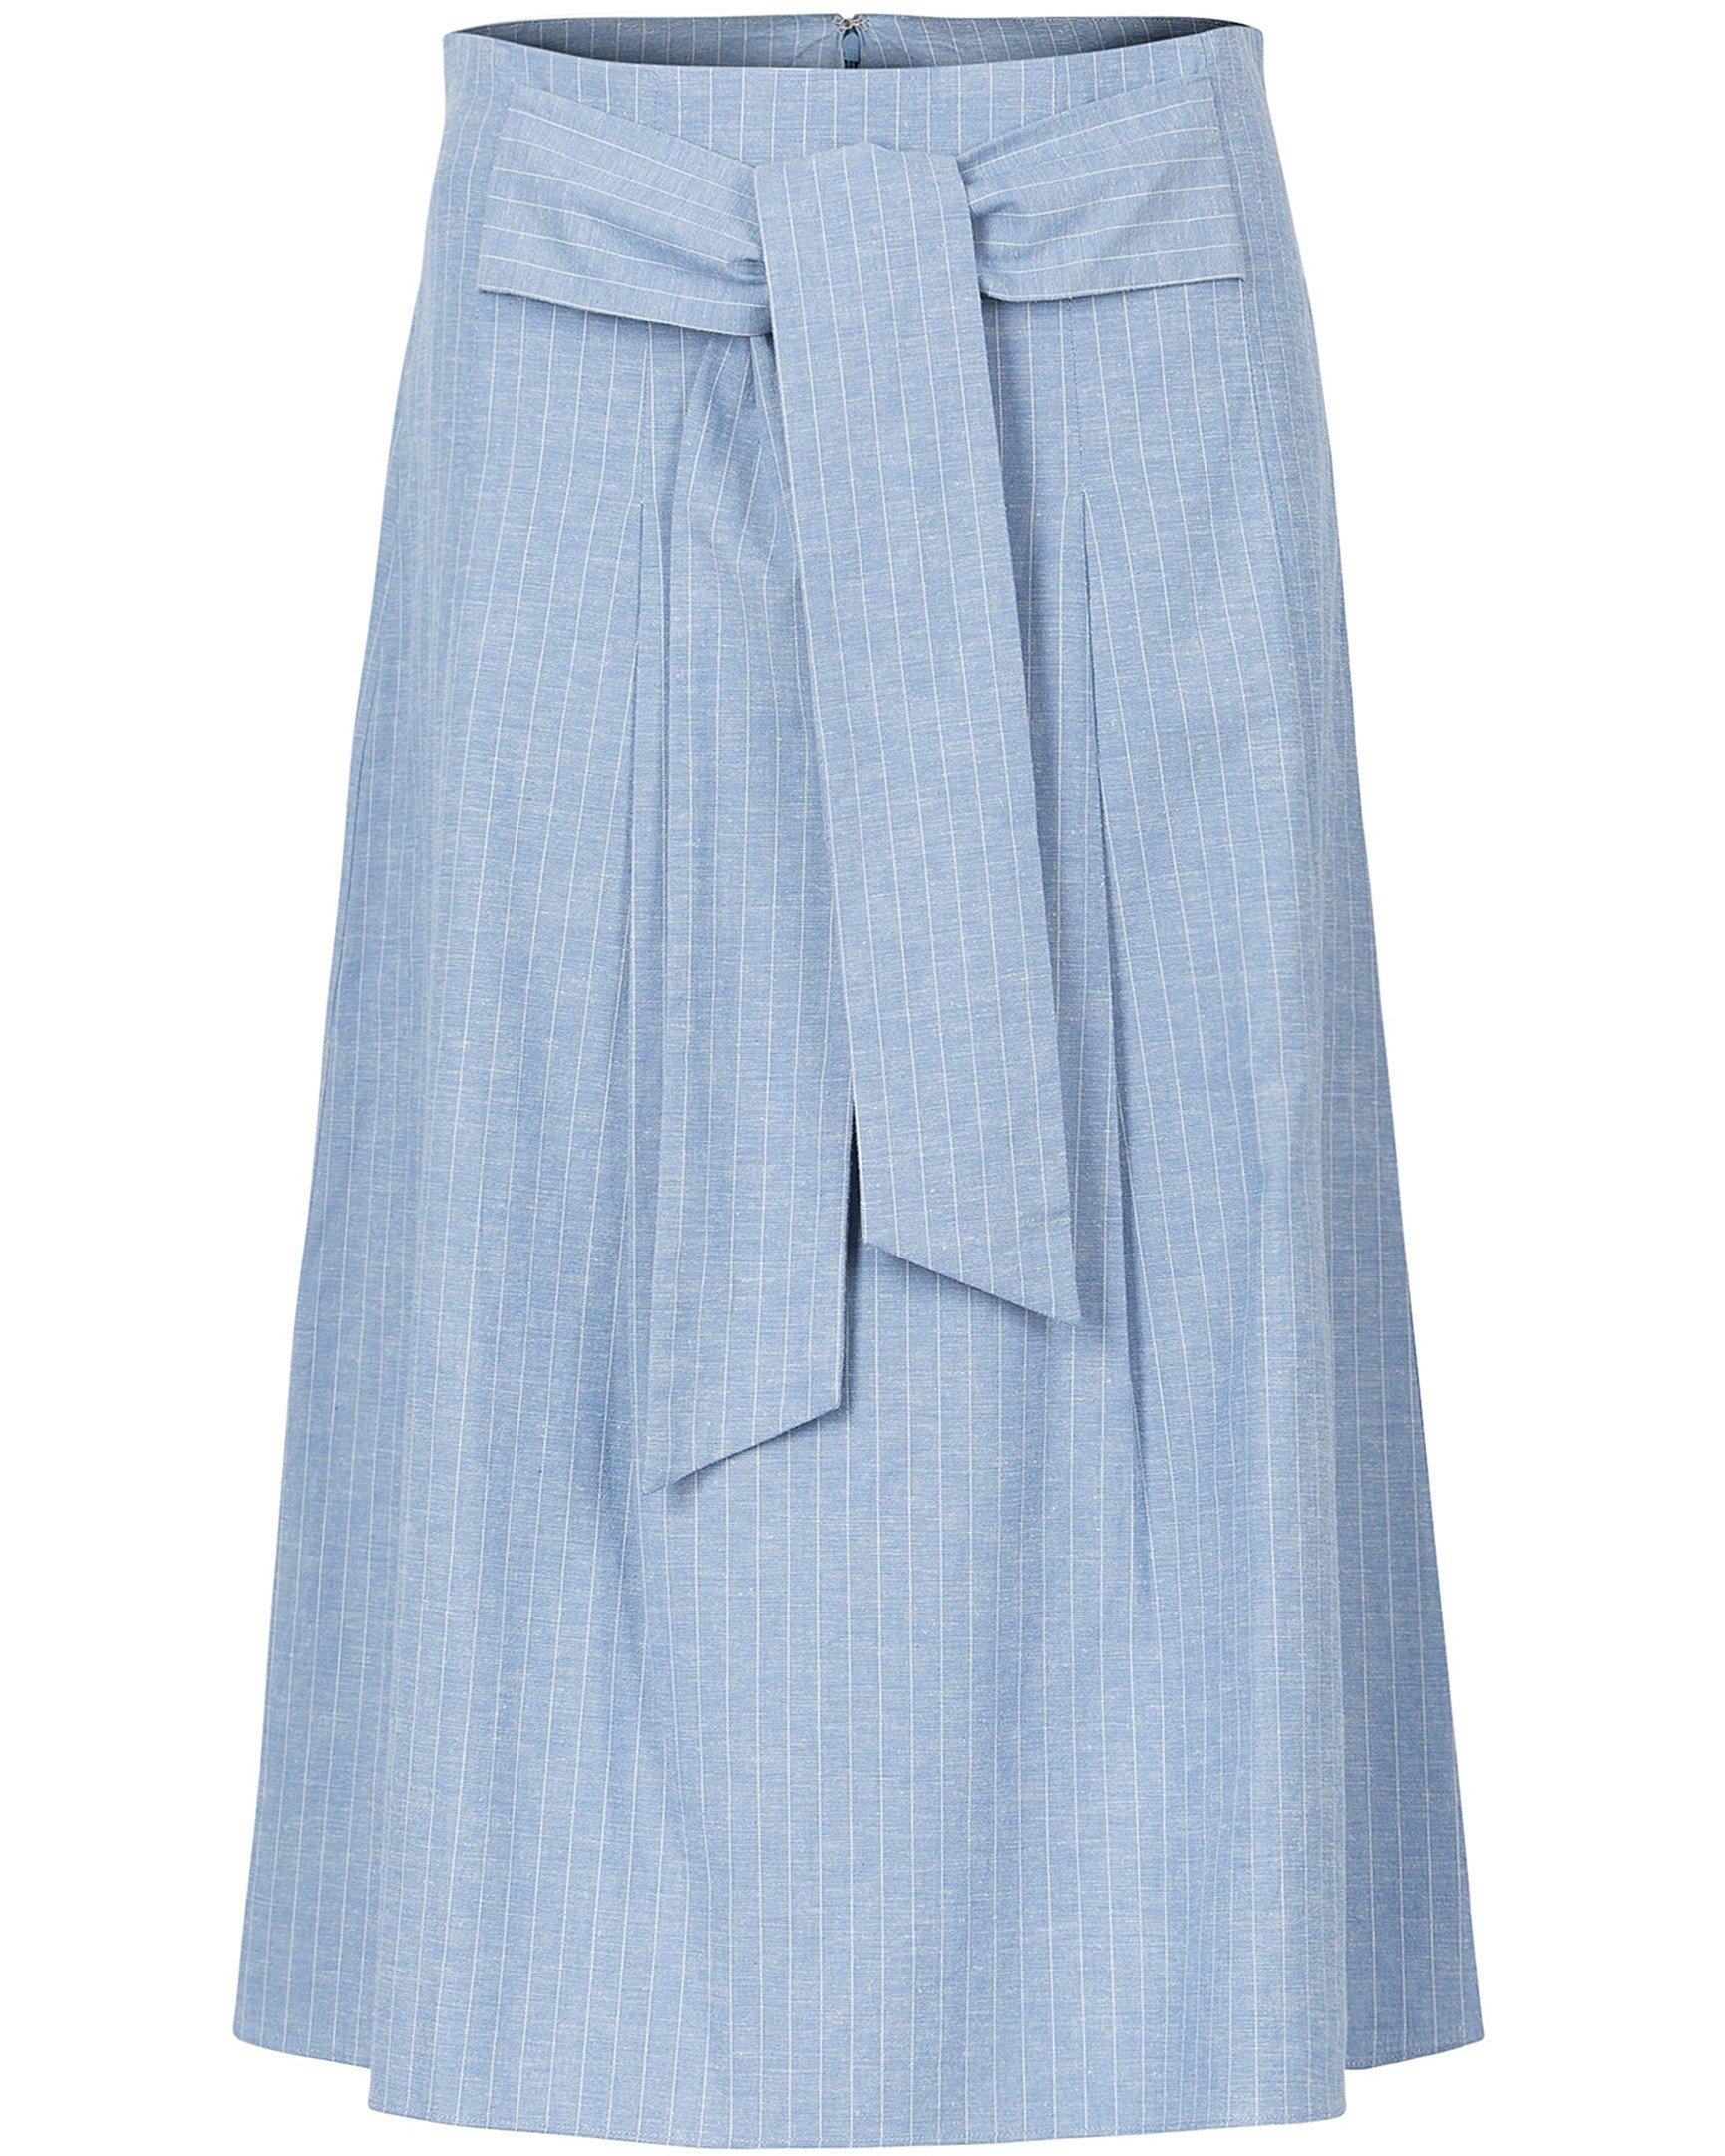 Entwined Stripe Midi Skirt 6c122970647